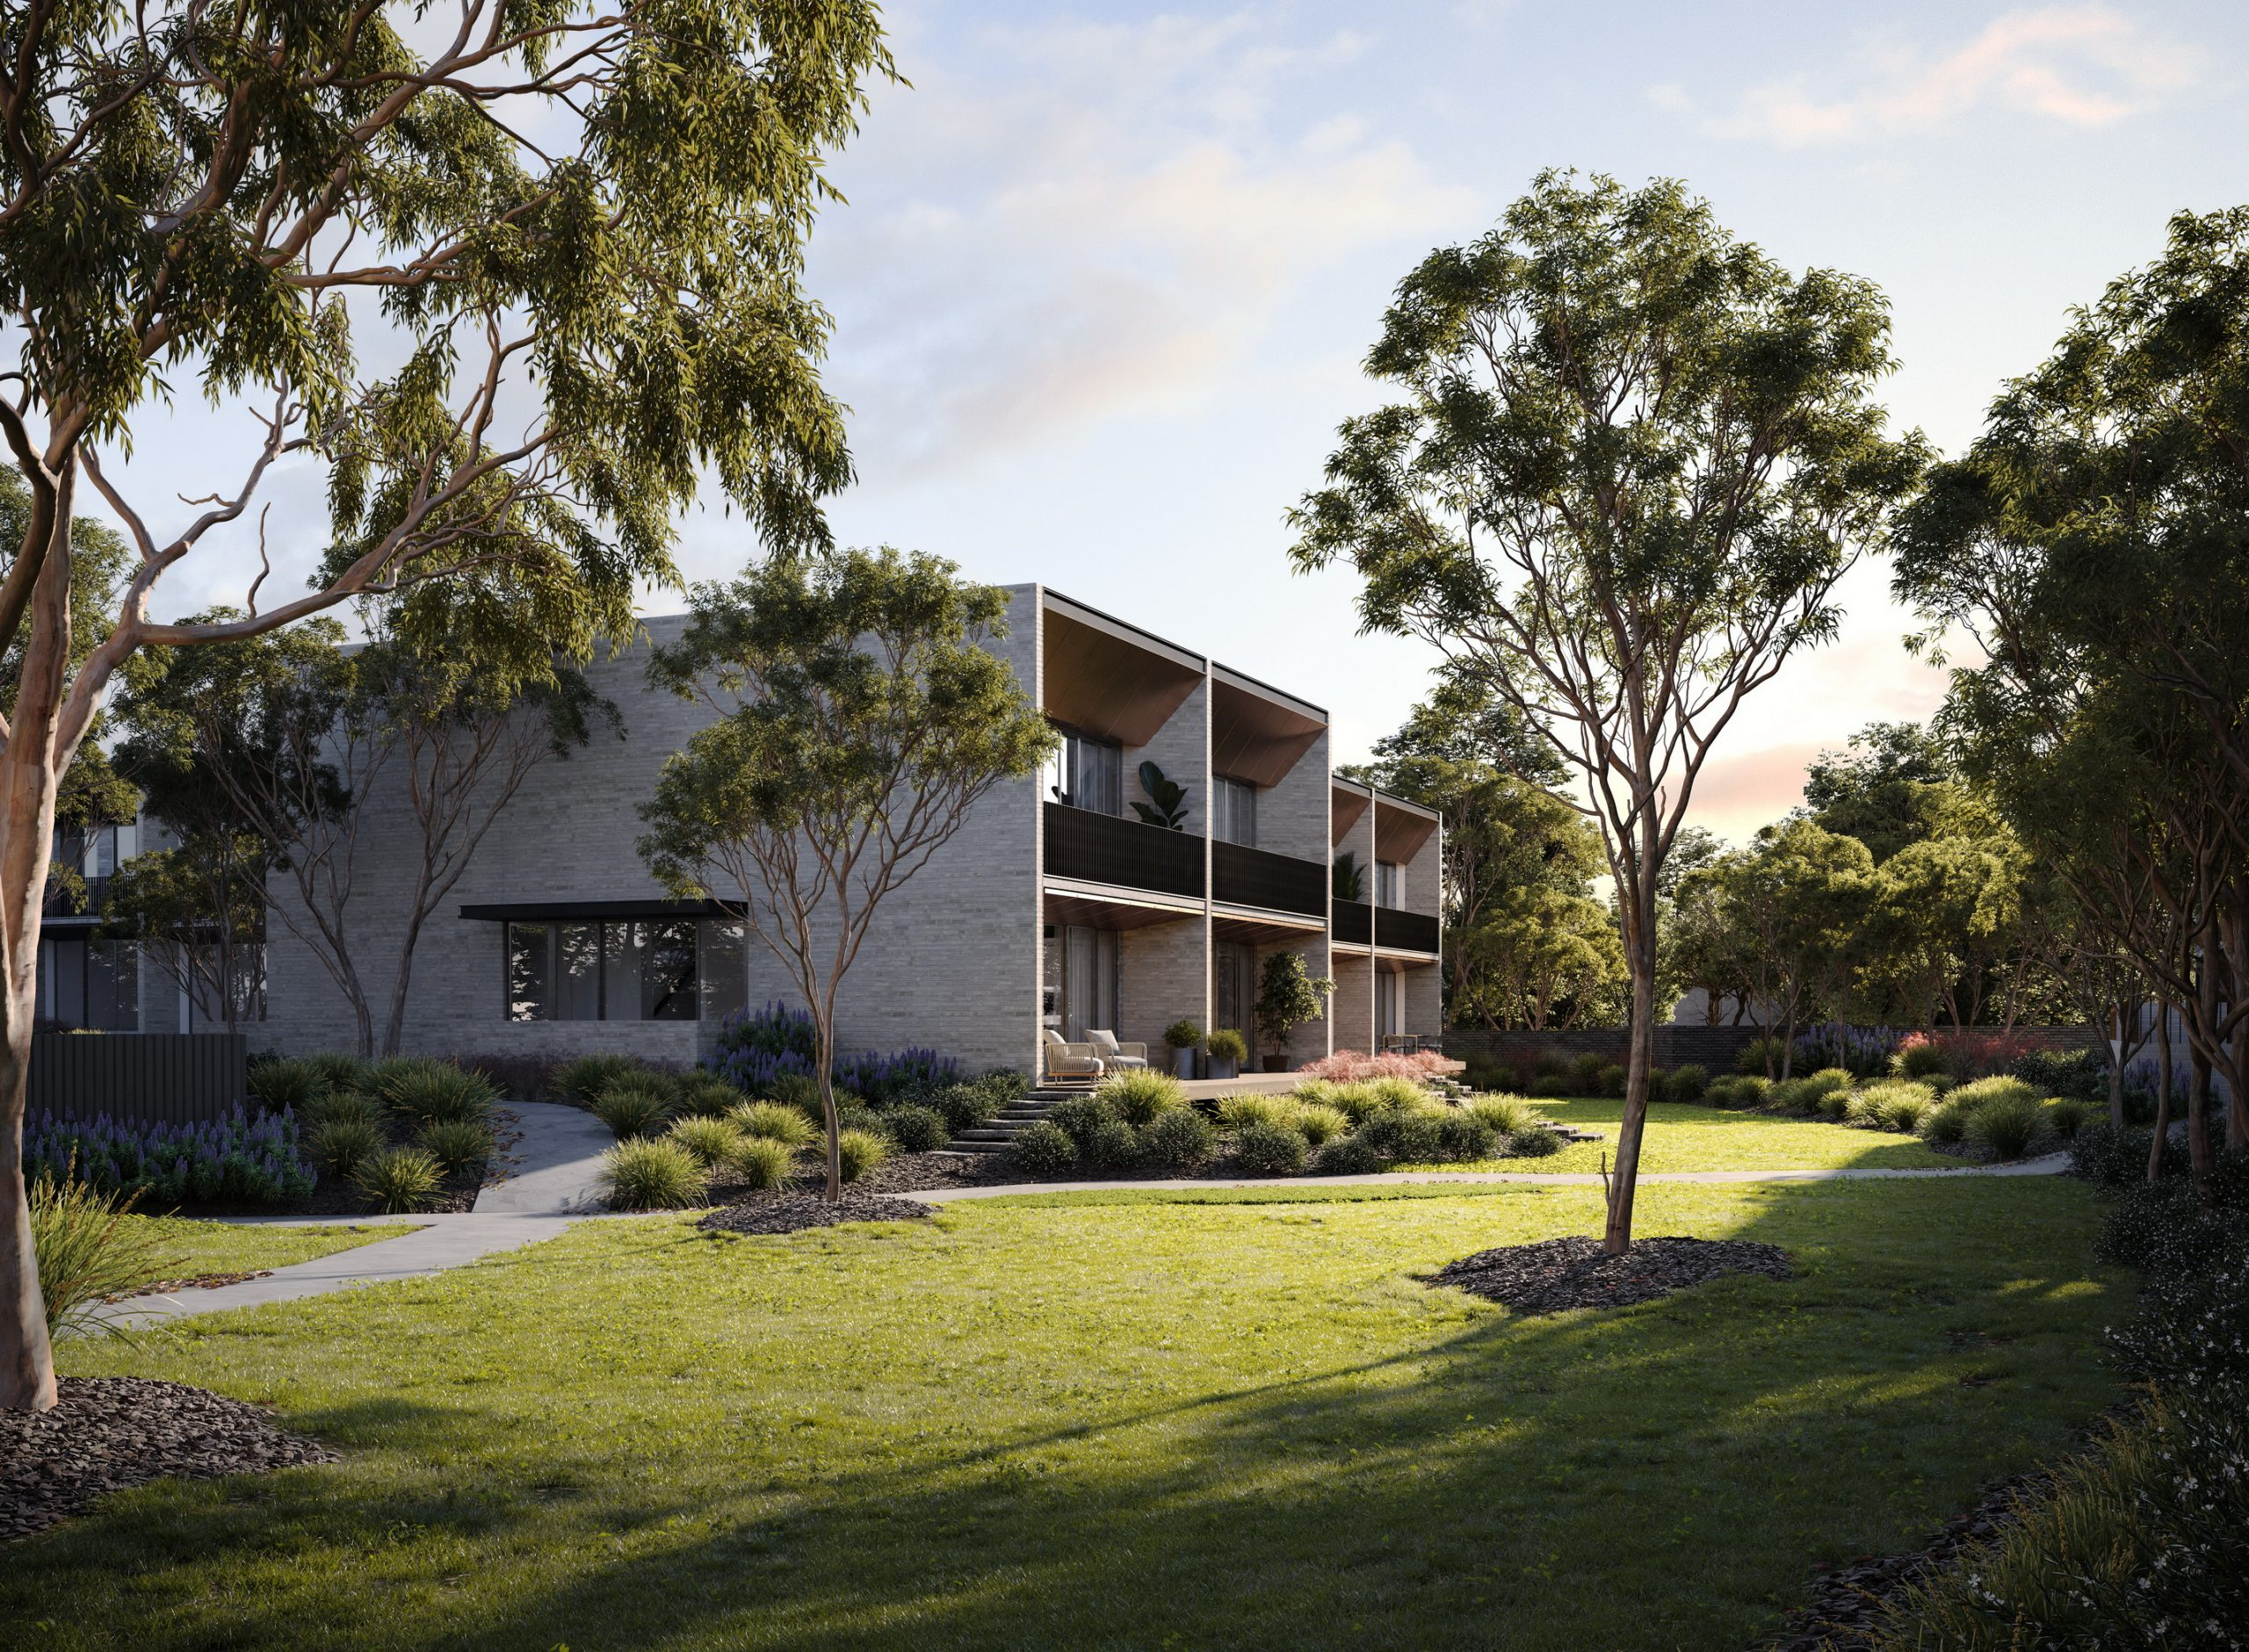 fkd-studio-render-architecture-image-the-grounds-exterior-ivanhoe-residential-parklands